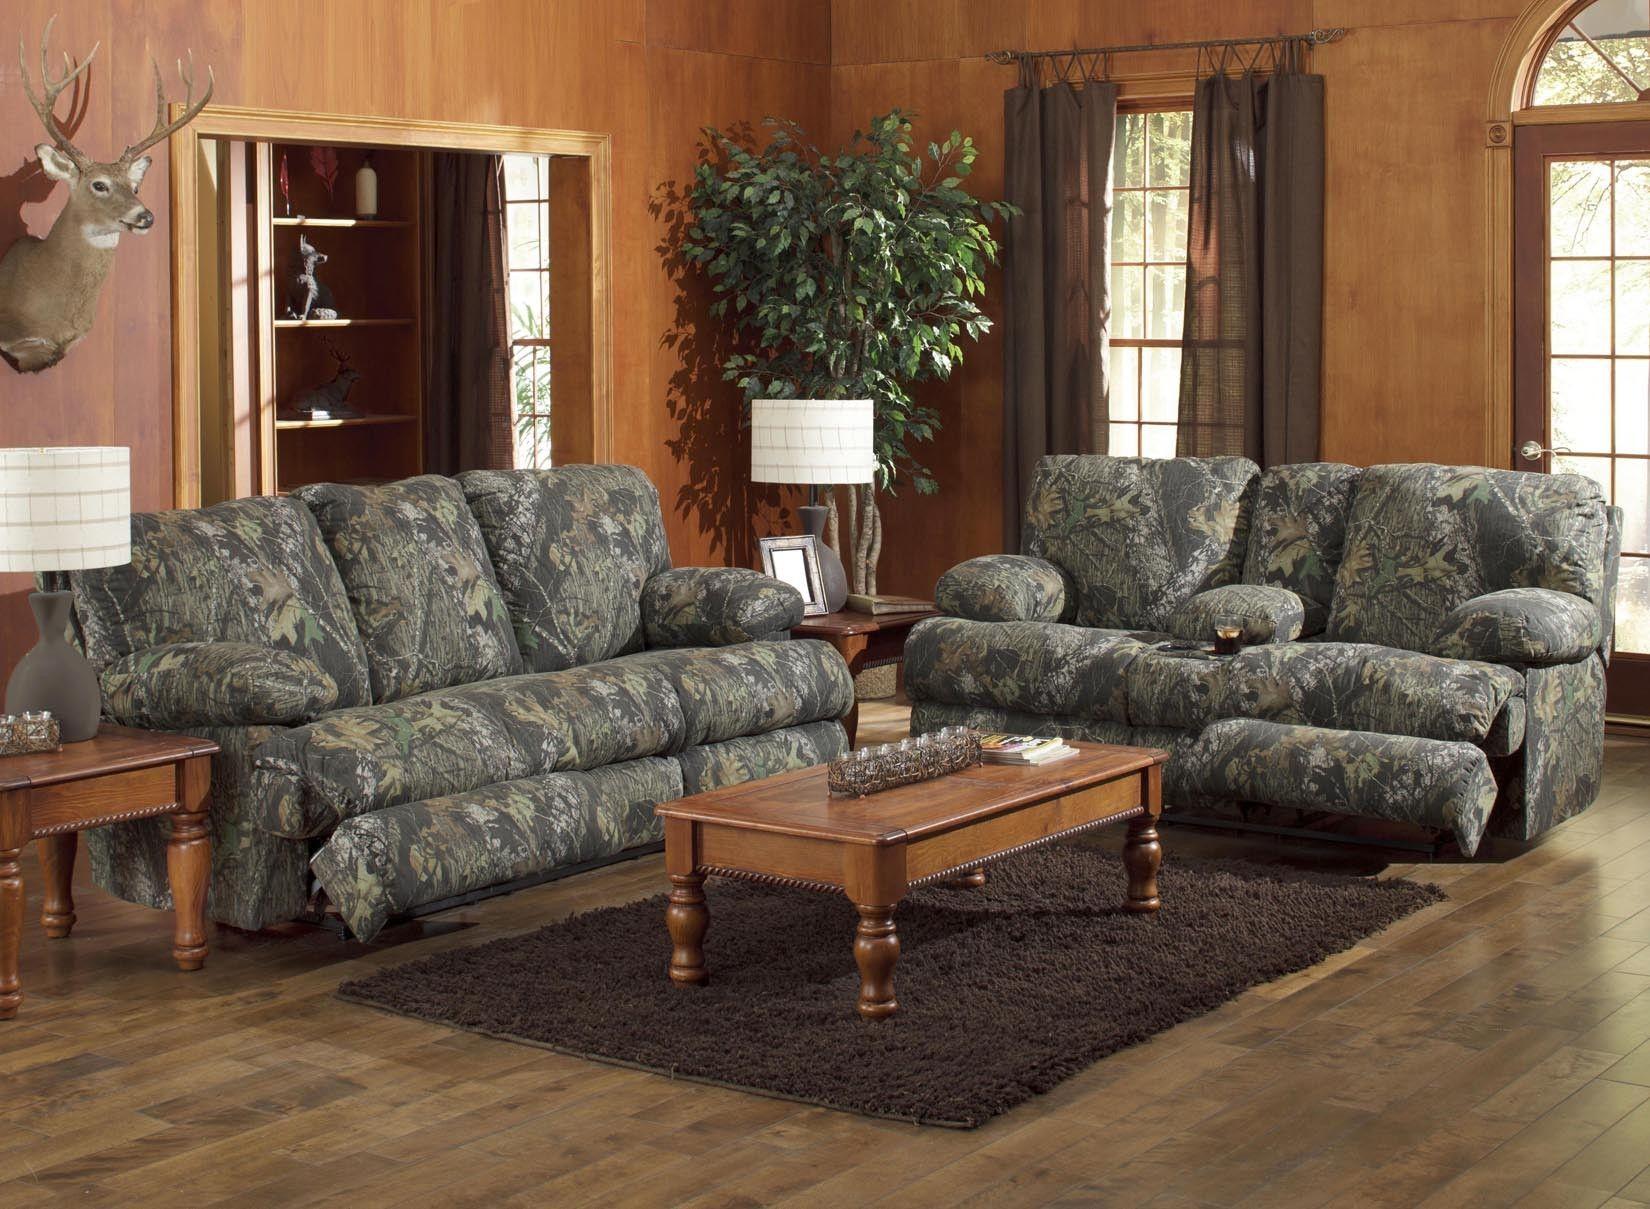 Catnapper Wintergreen Mossy Oak Camo Reclining Sofa And Love Seat